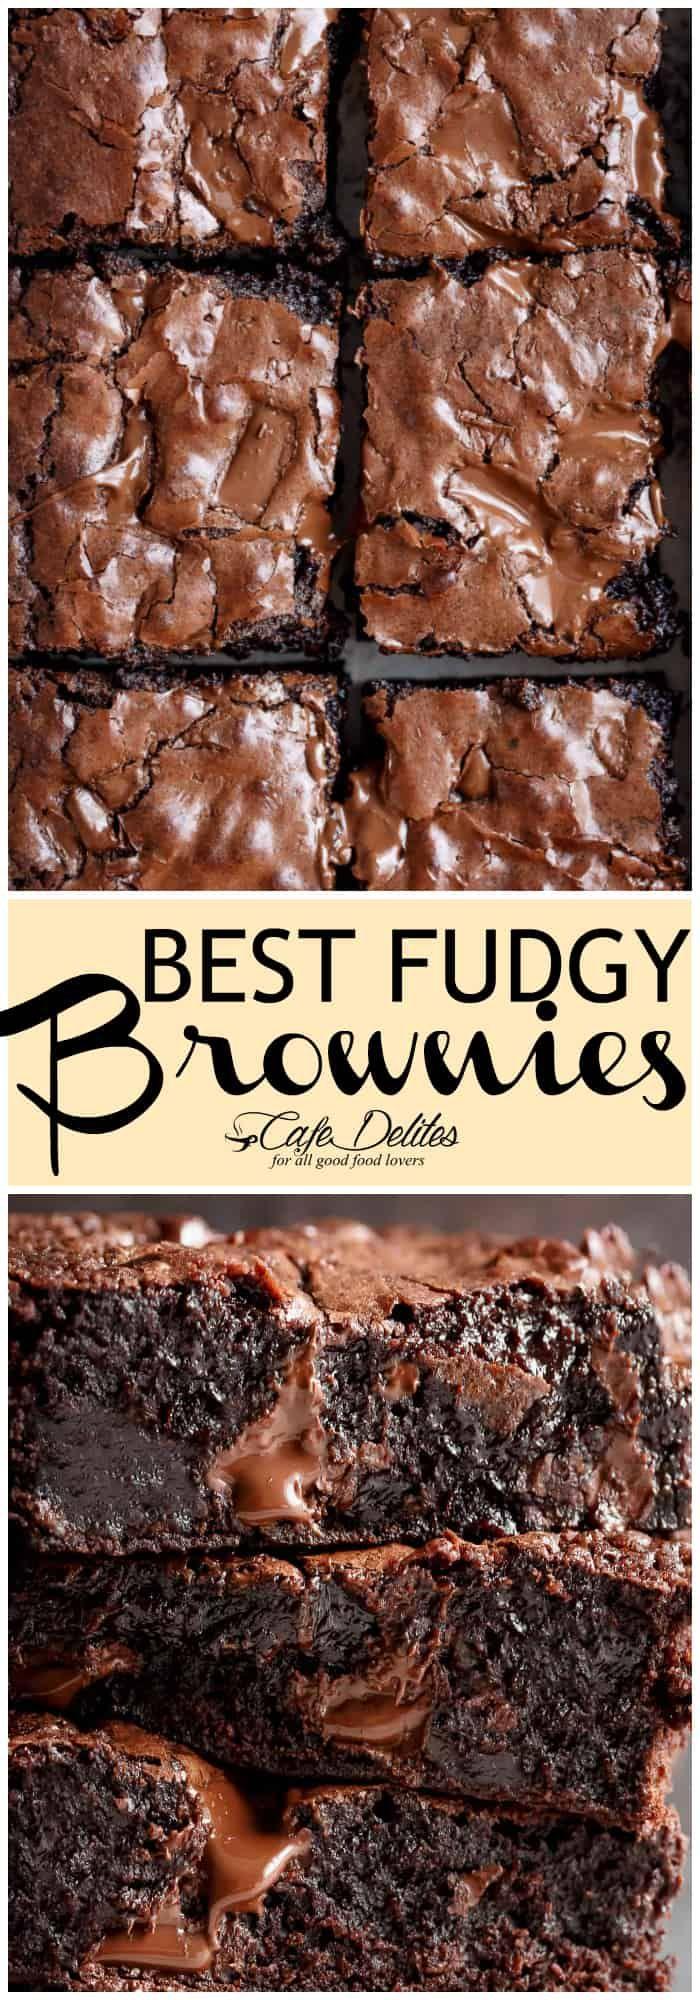 Worlds Best Fudgiest Brownies - Cafe Delites